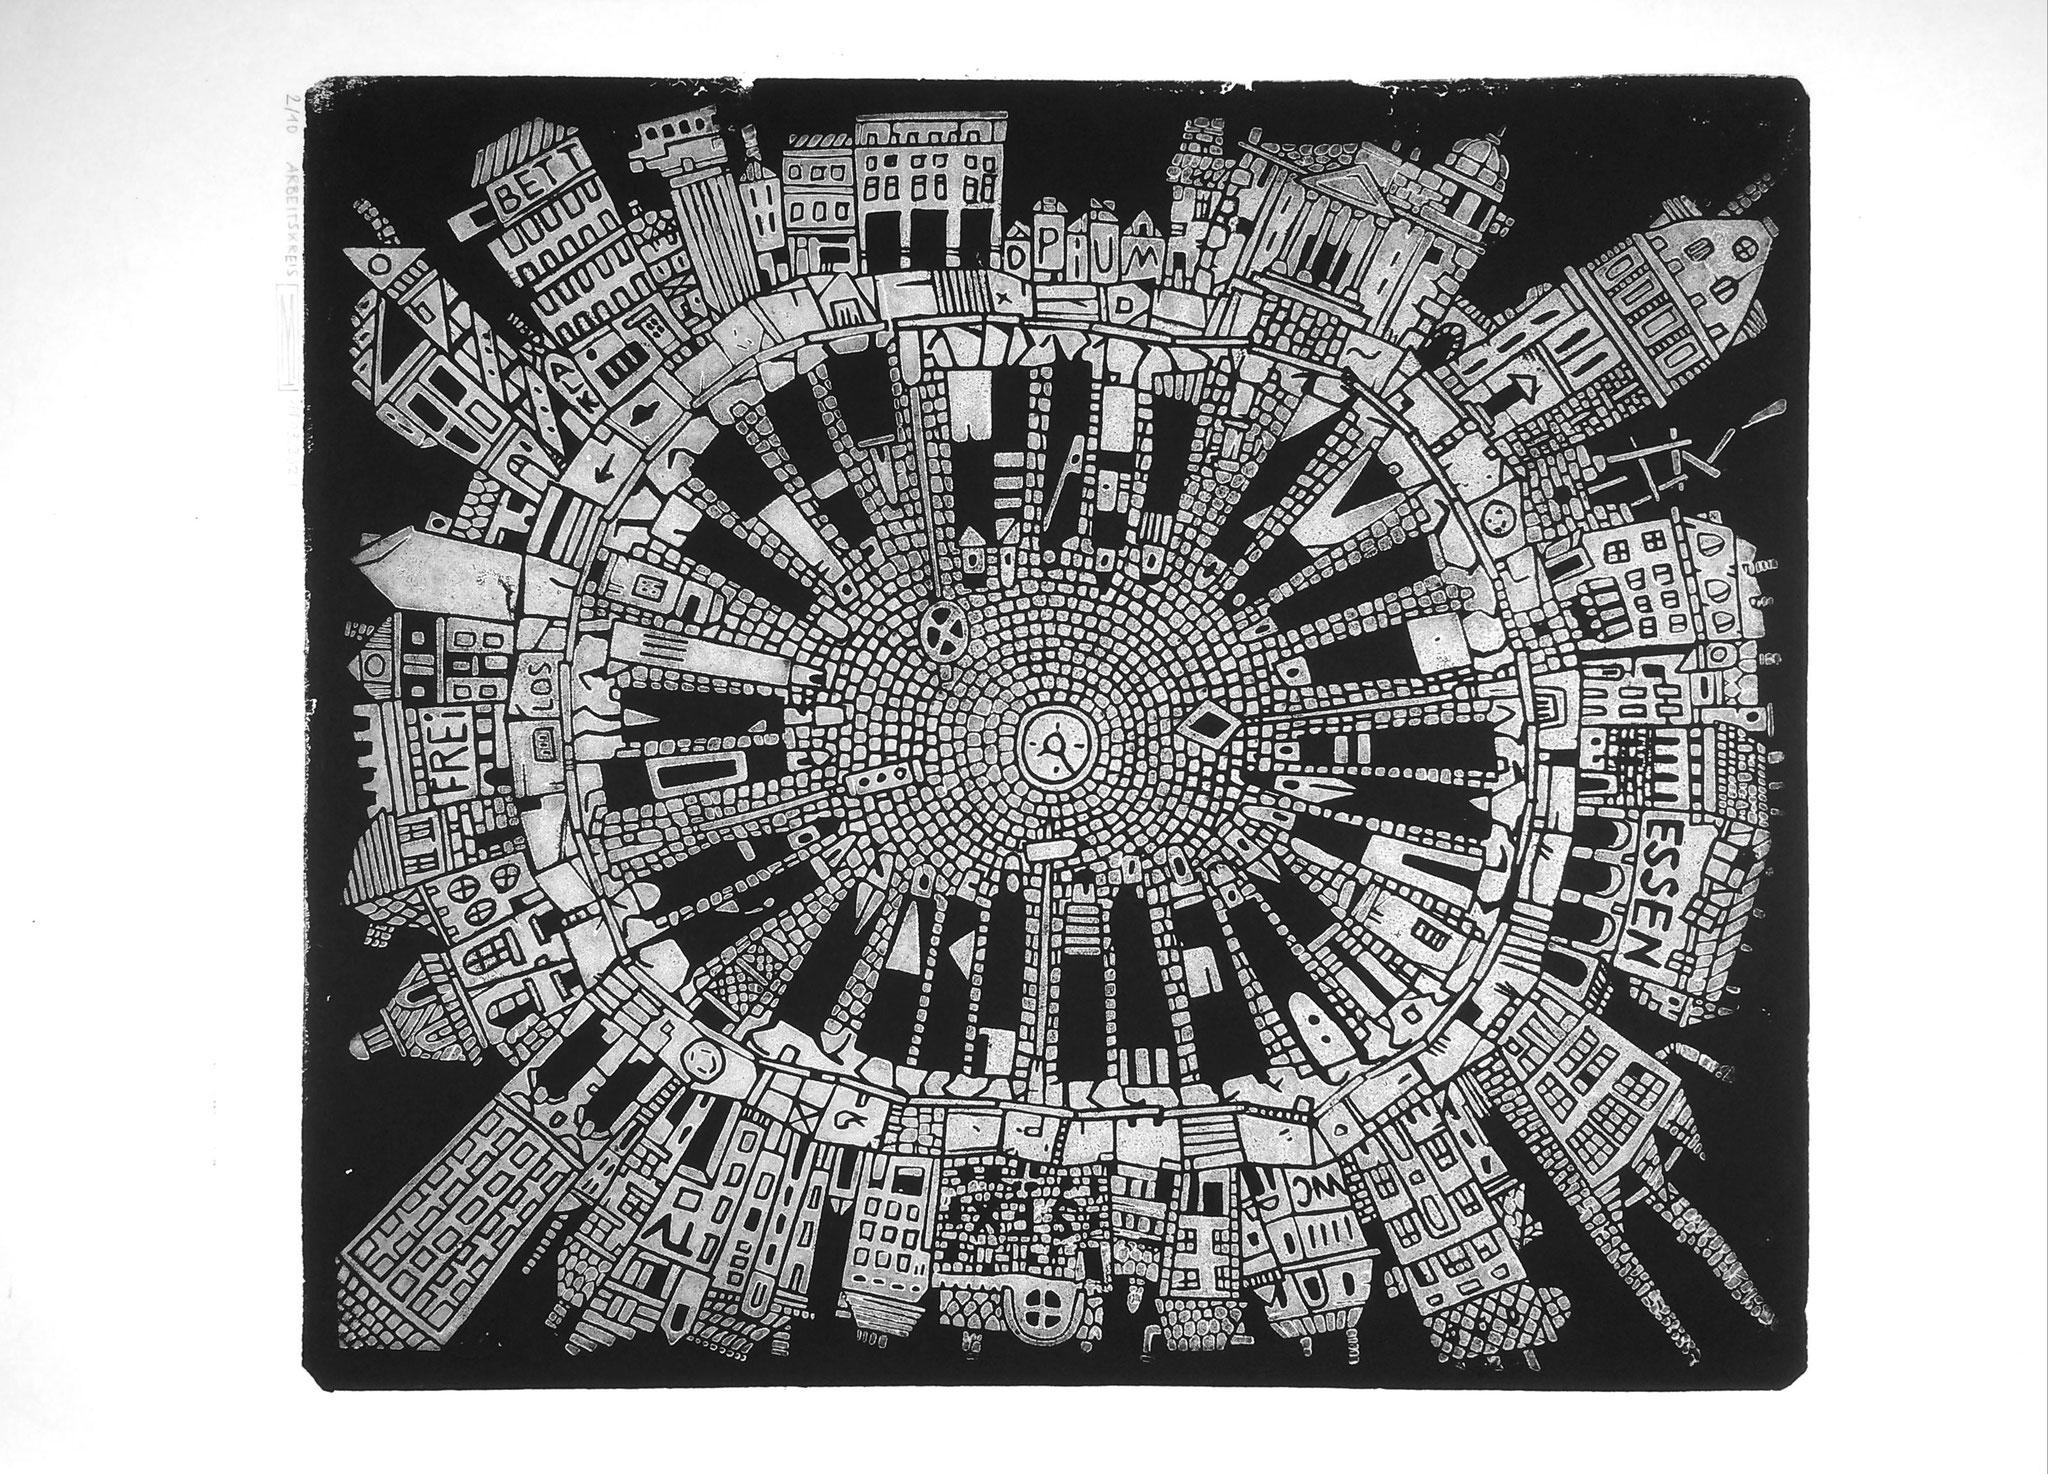 Arbeitskreis, Linoldruck, 35 x 30,5 cm